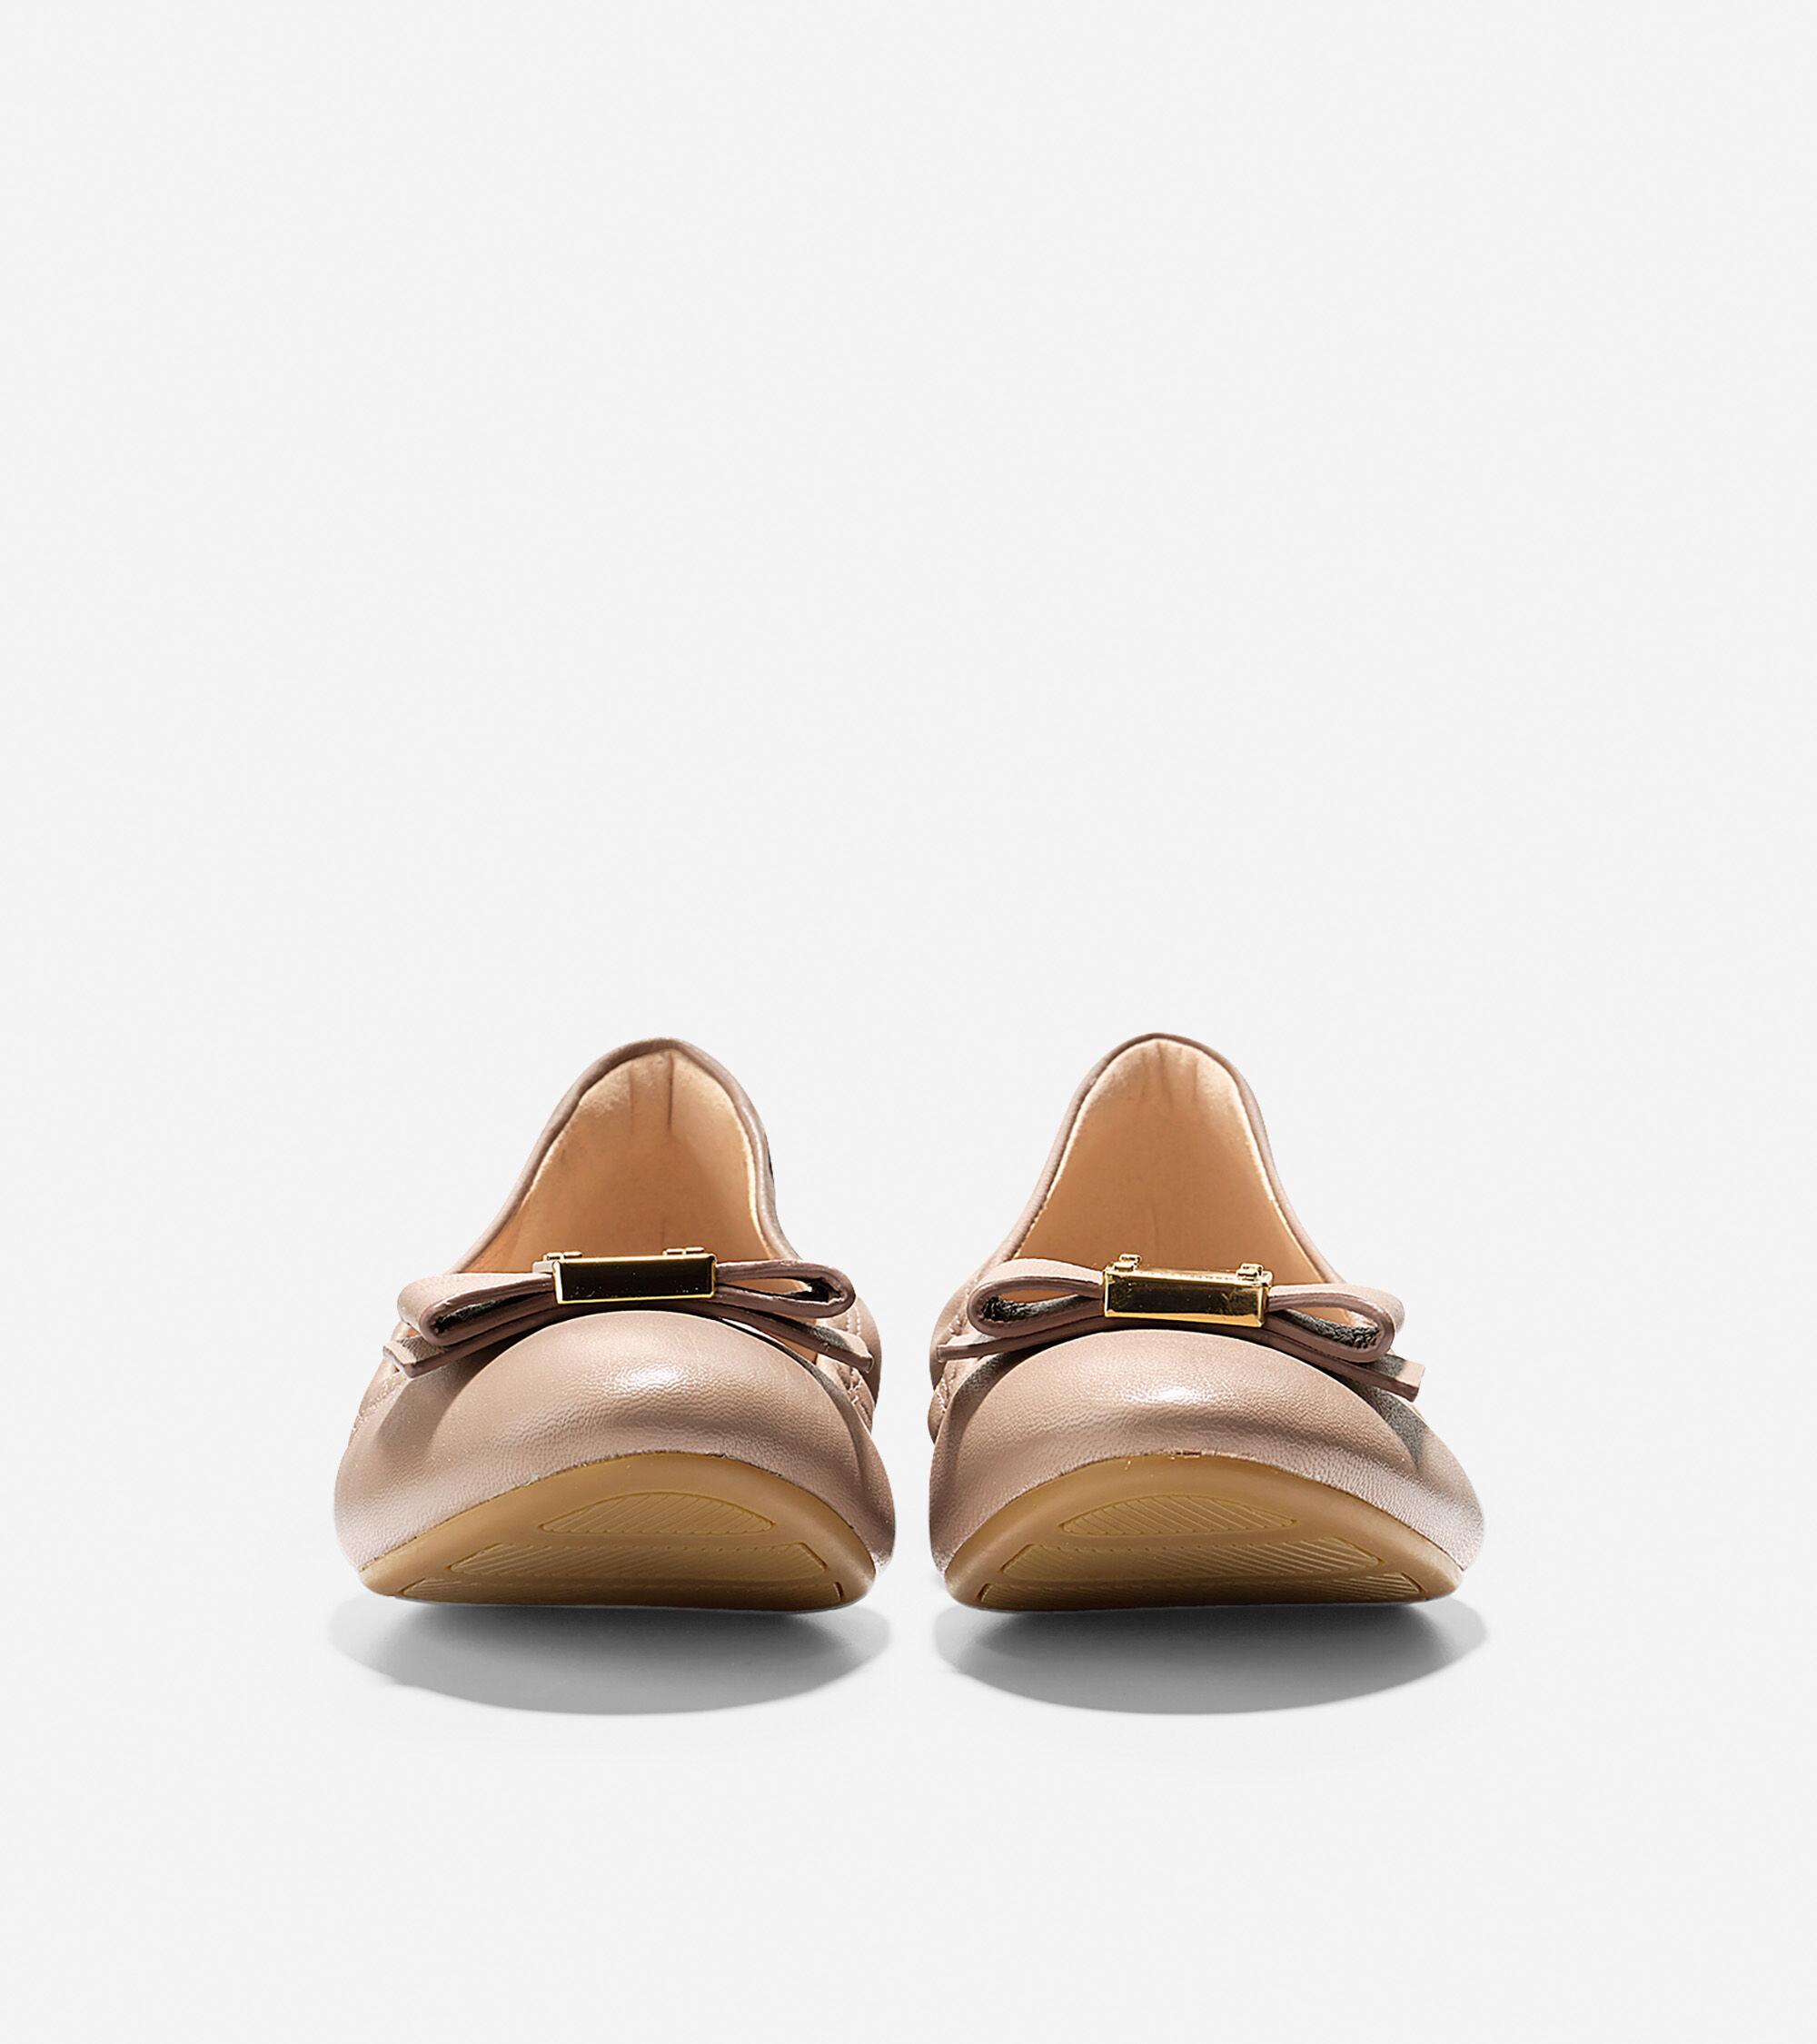 ad925461c491 Tali Bow Ballet Flat · Tali Bow Ballet Flat ...